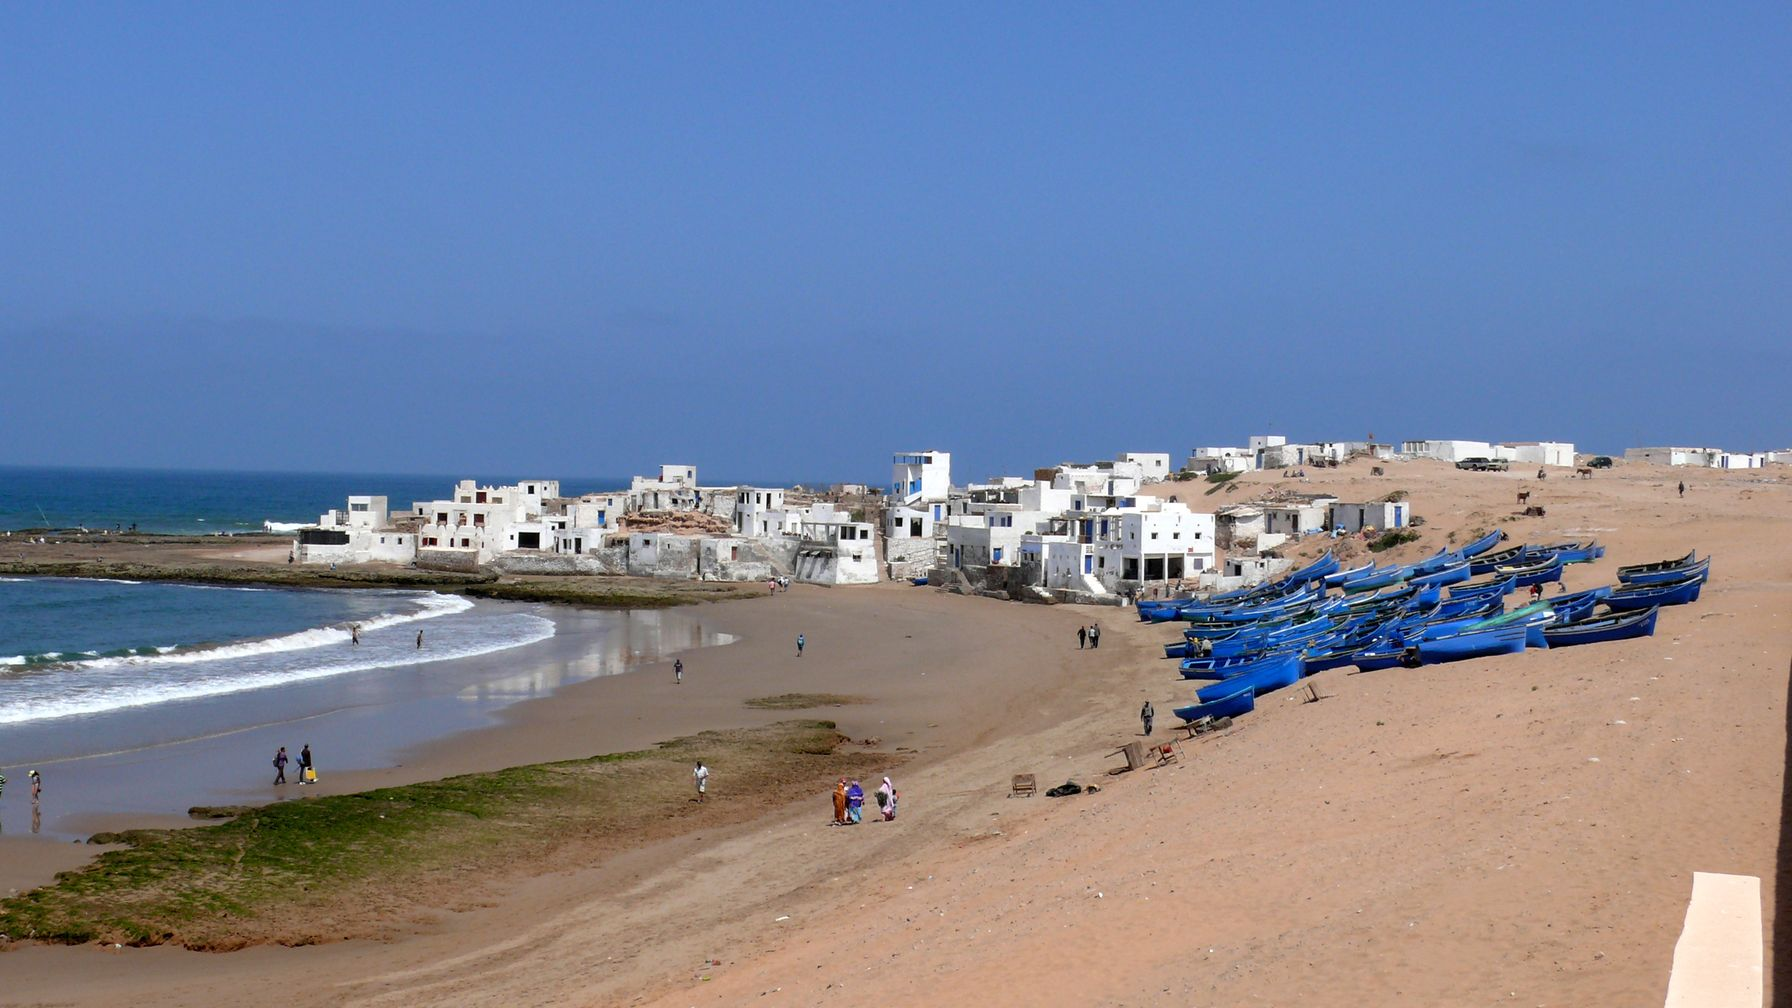 La plage des Chleuhs P1130144